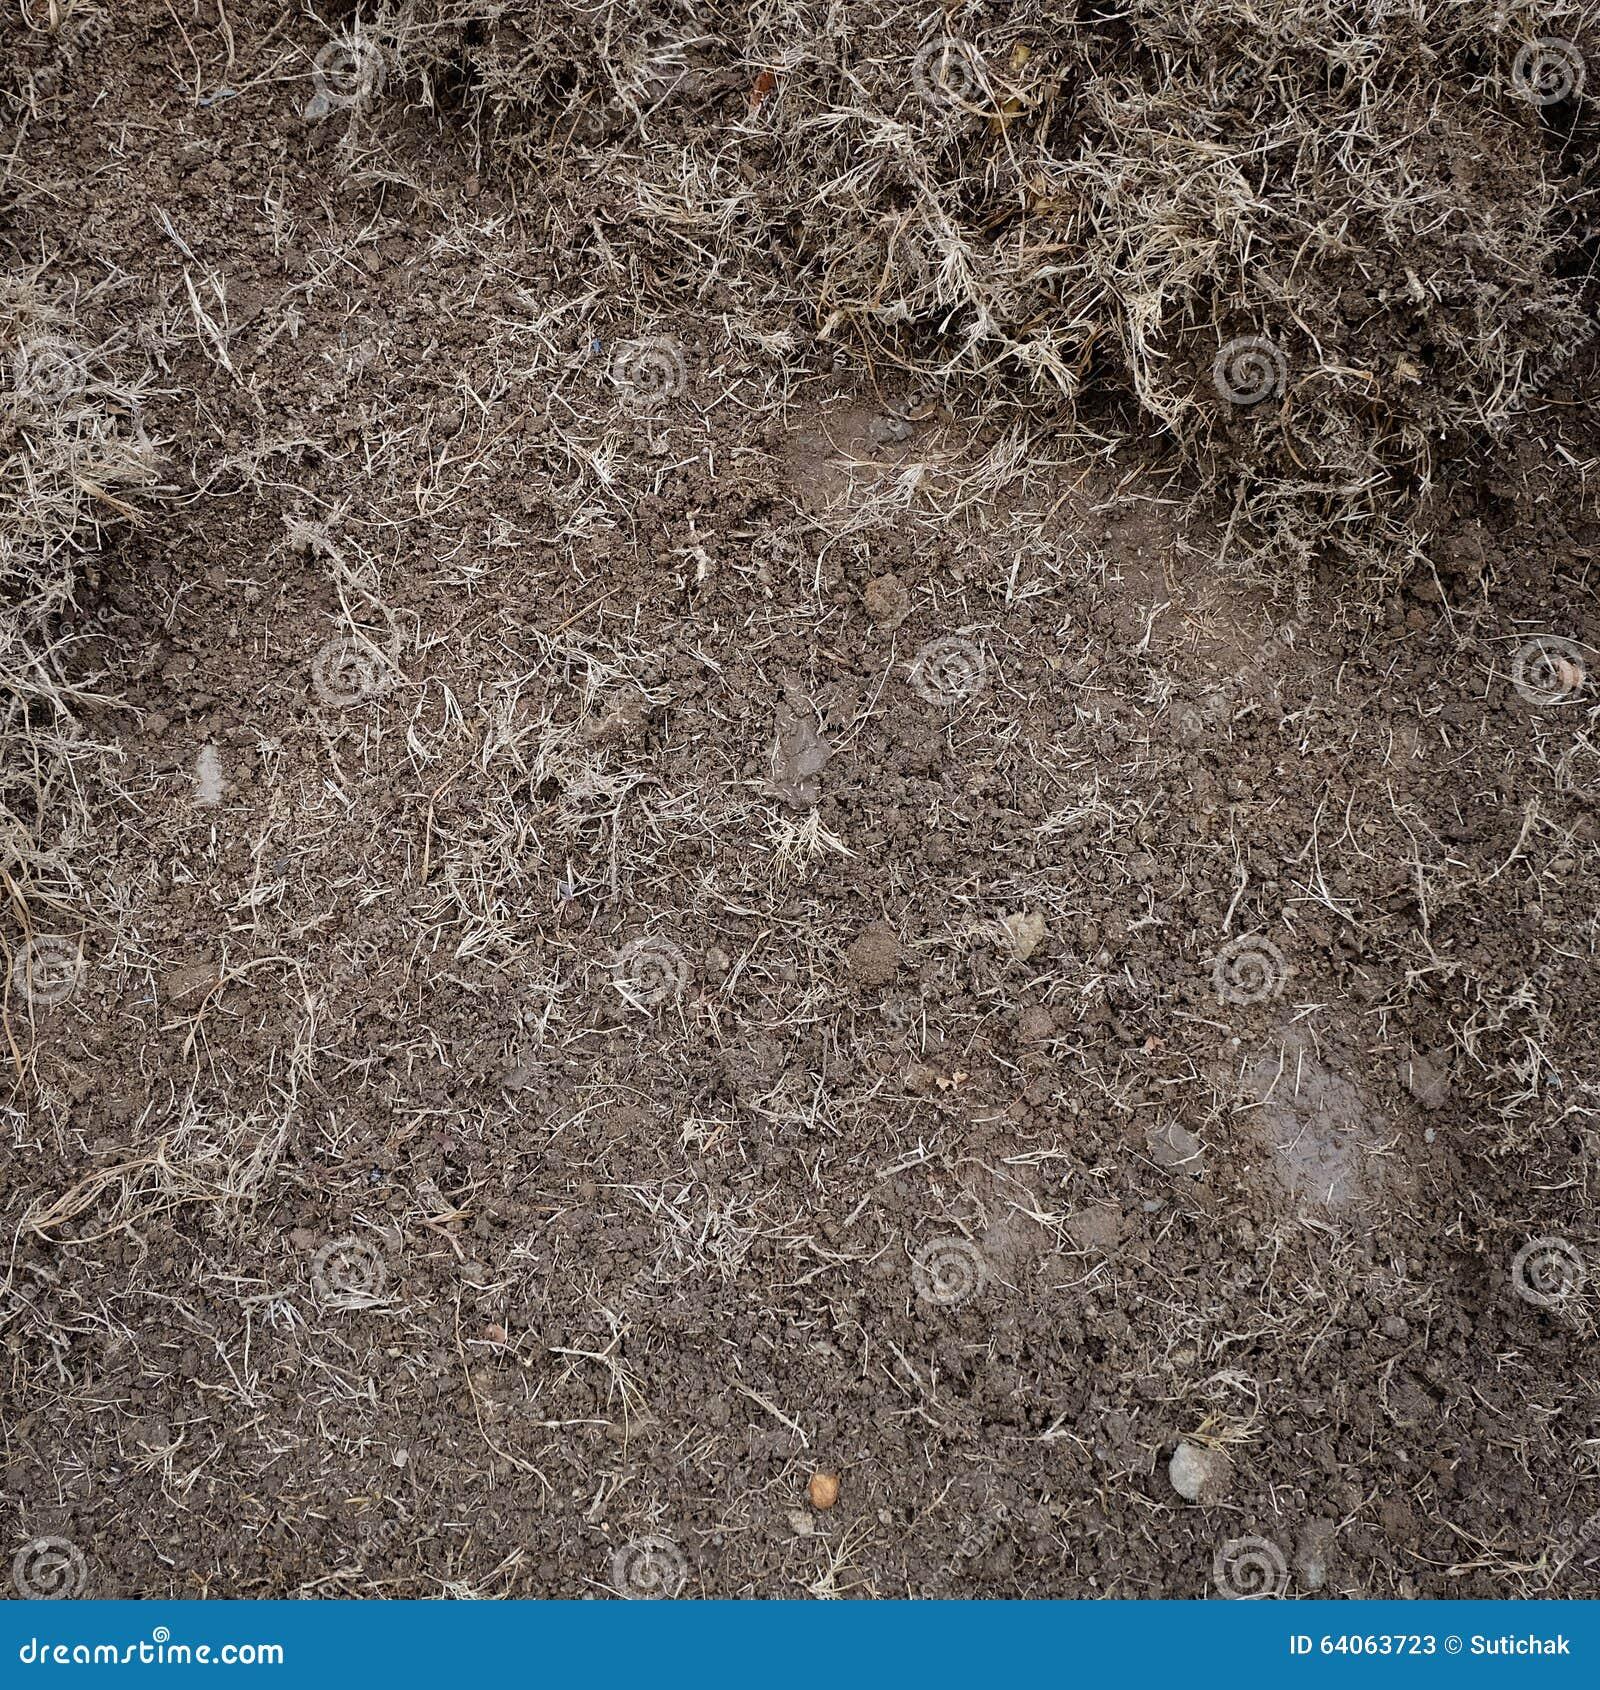 Yard work preparation soil in garden stock photo image 64063723 - Gardening works in october winter preparations ...